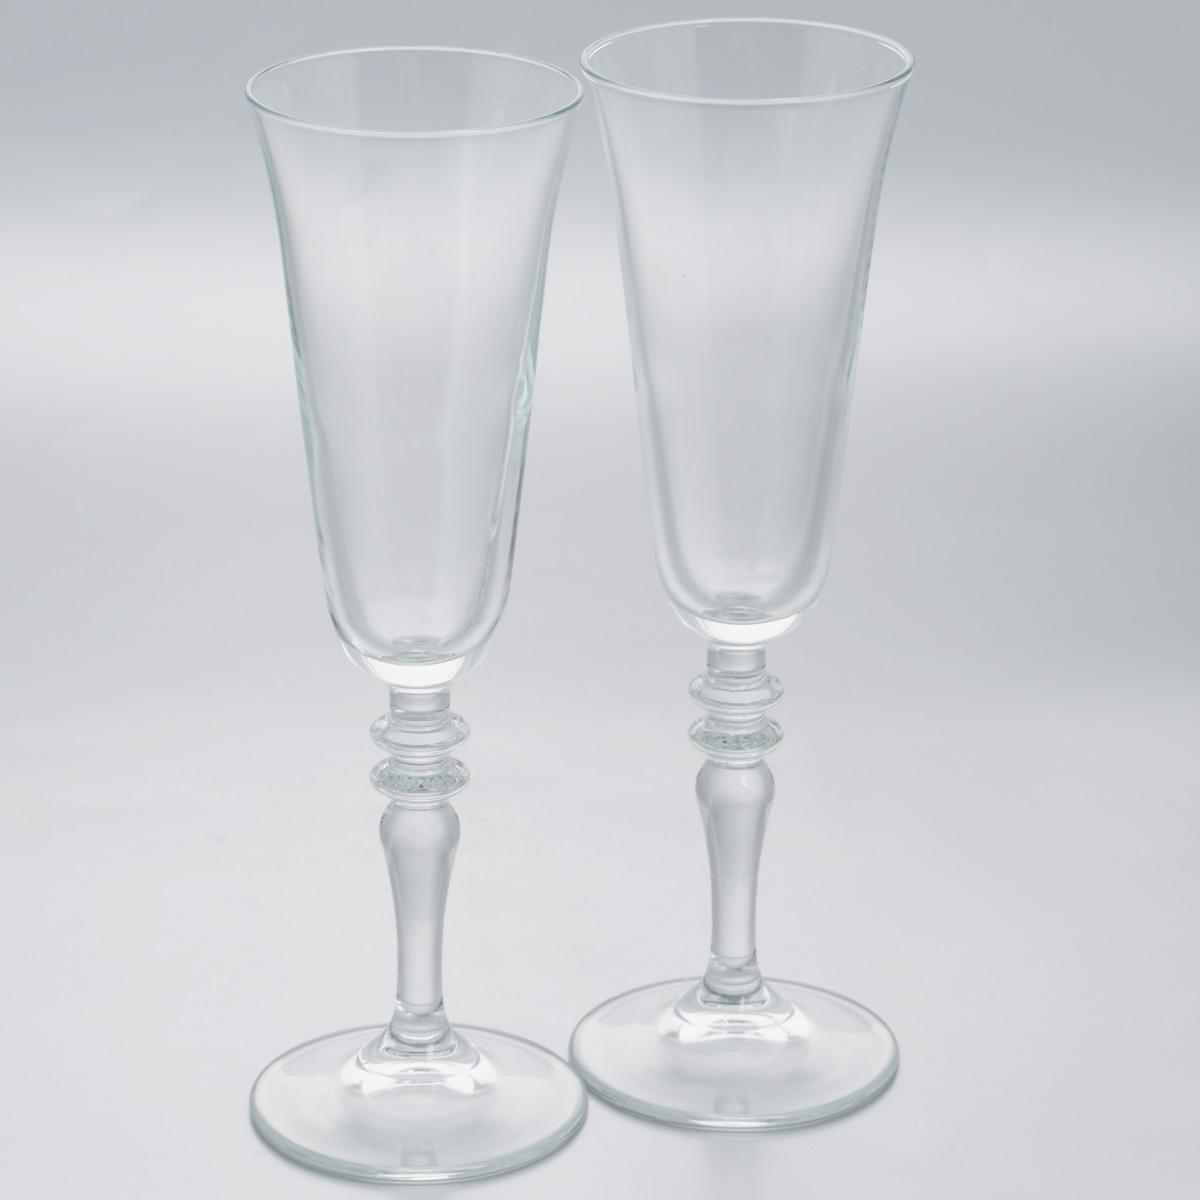 Набор бокалов Pasabahce Vintage, 190 мл, 2 шт набор бокалов для бренди коралл 40600 q8105 400 анжела